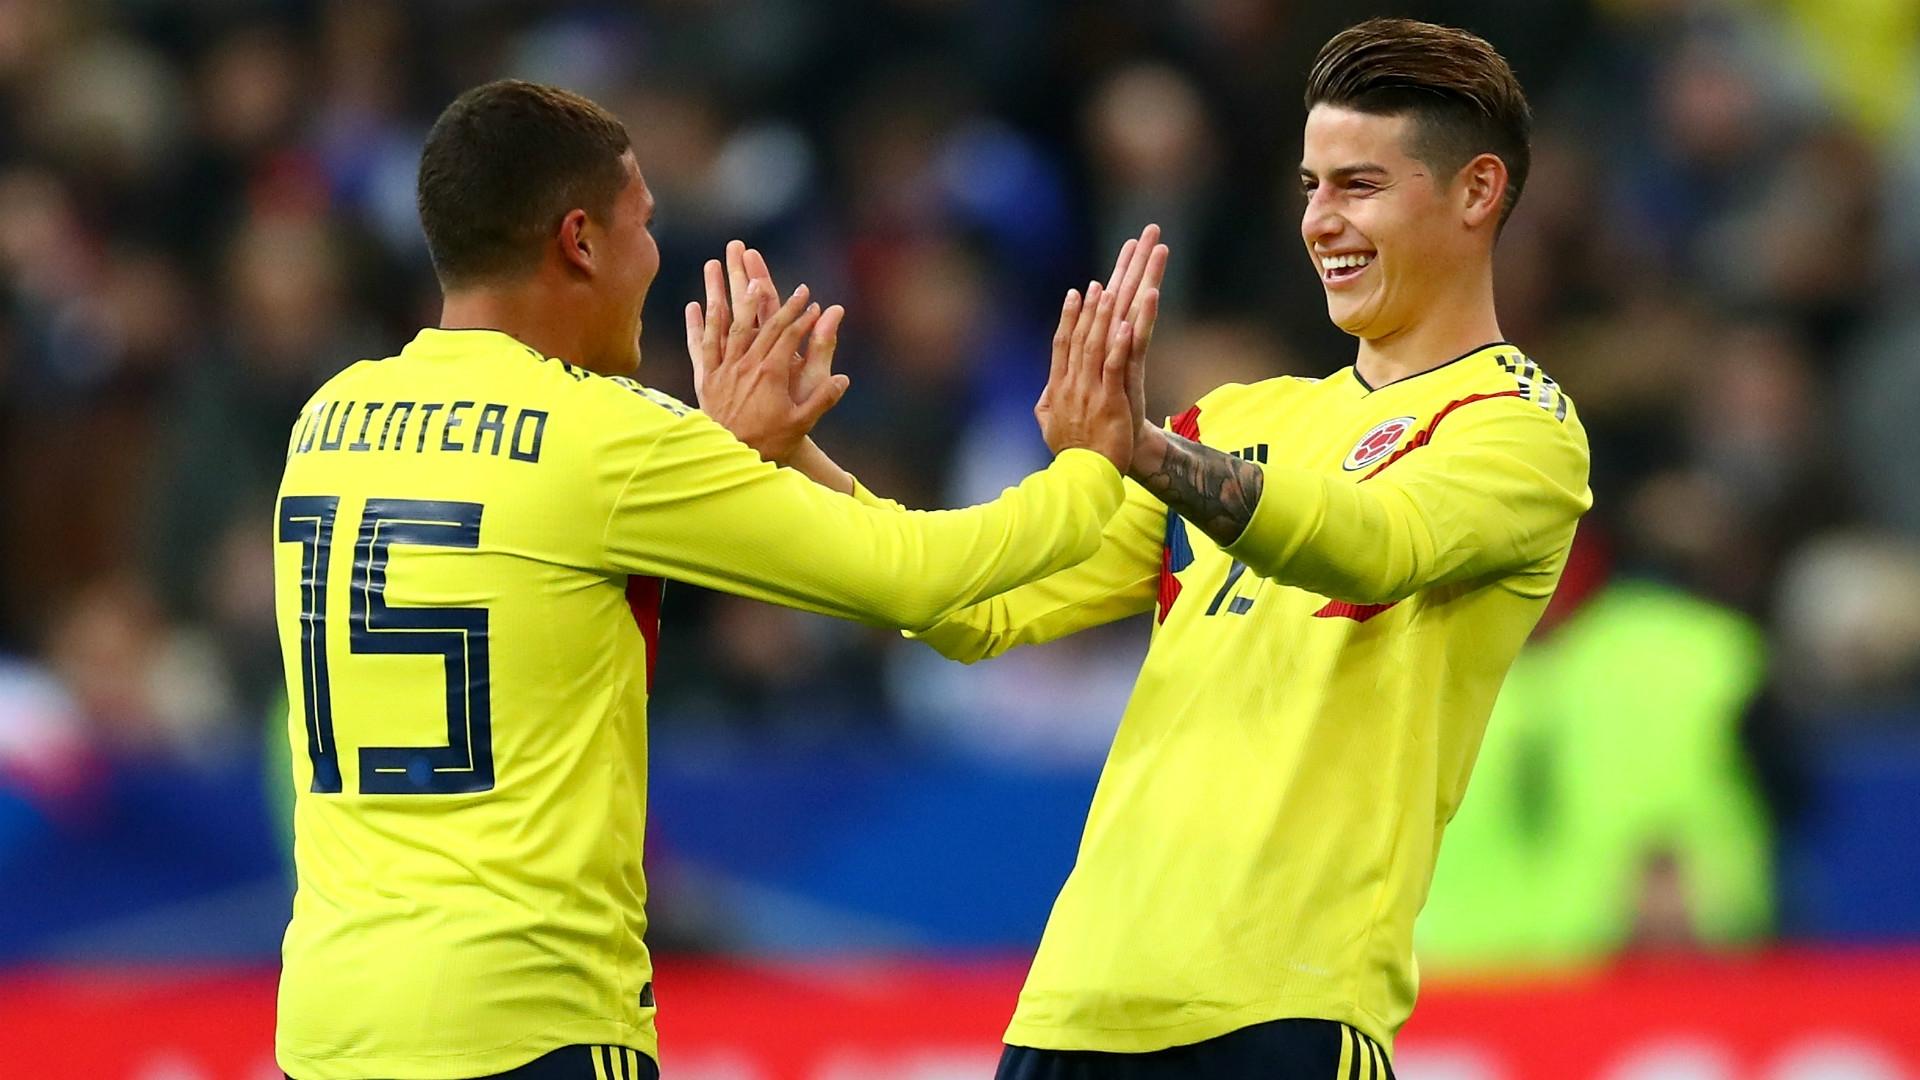 James Rodriguez (Bayern Munchen) - Colombia